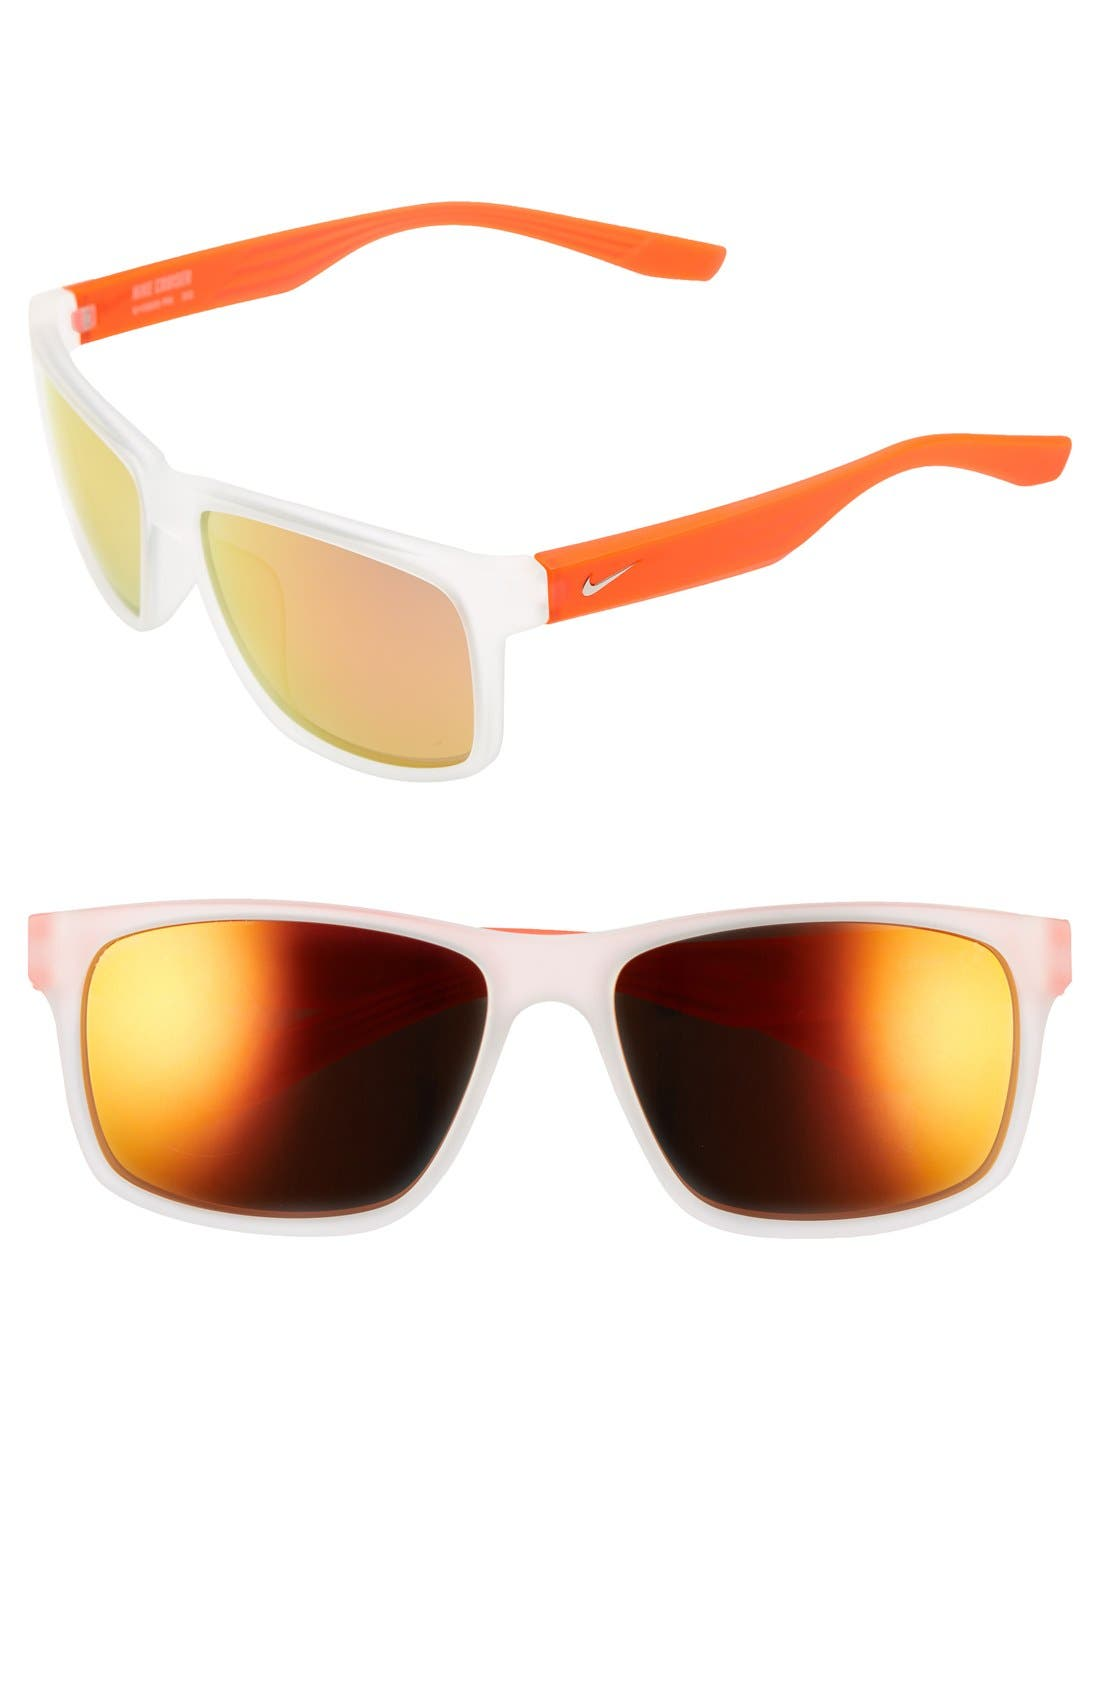 Main Image - Nike 'Cruiser R' 59mm Sunglasses